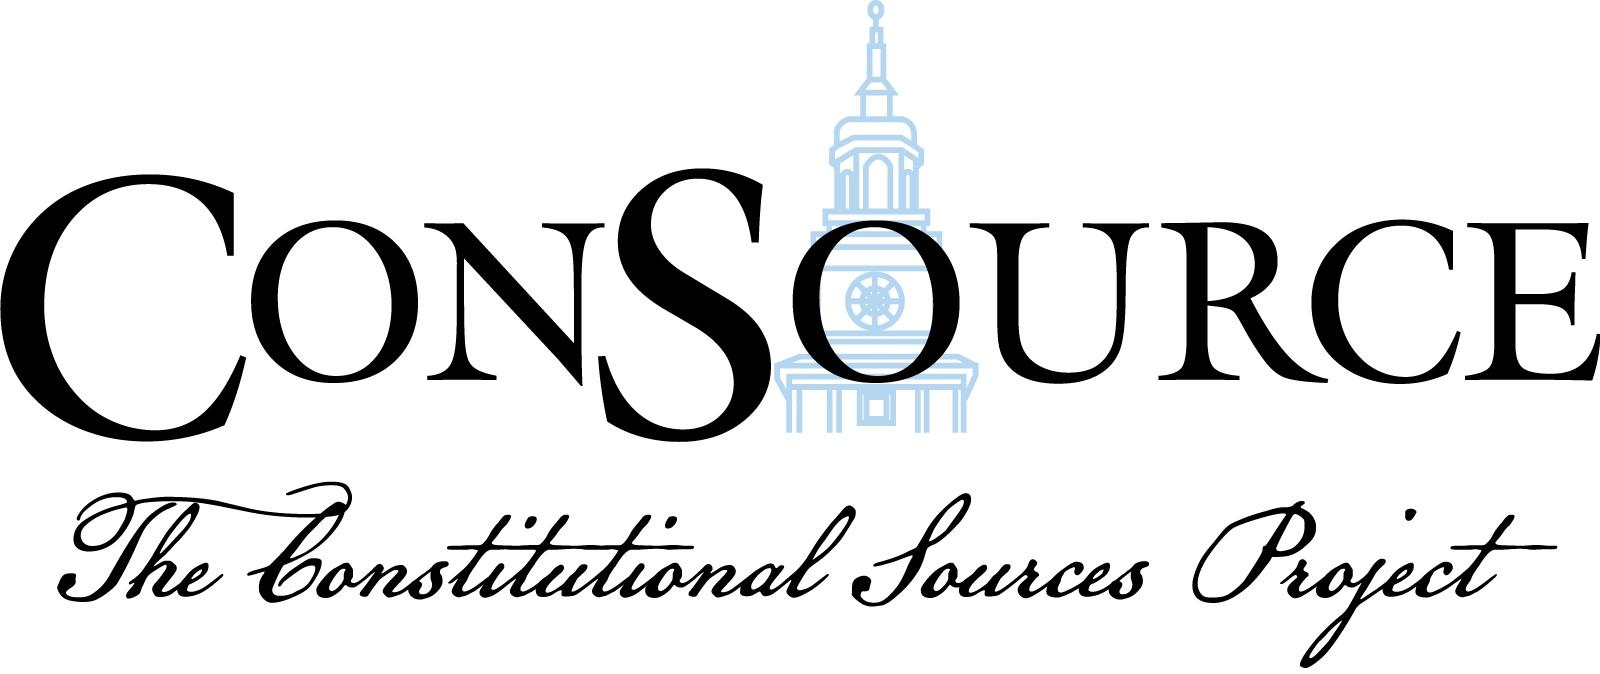 Consource-Logo-Master-1600-1.jpg